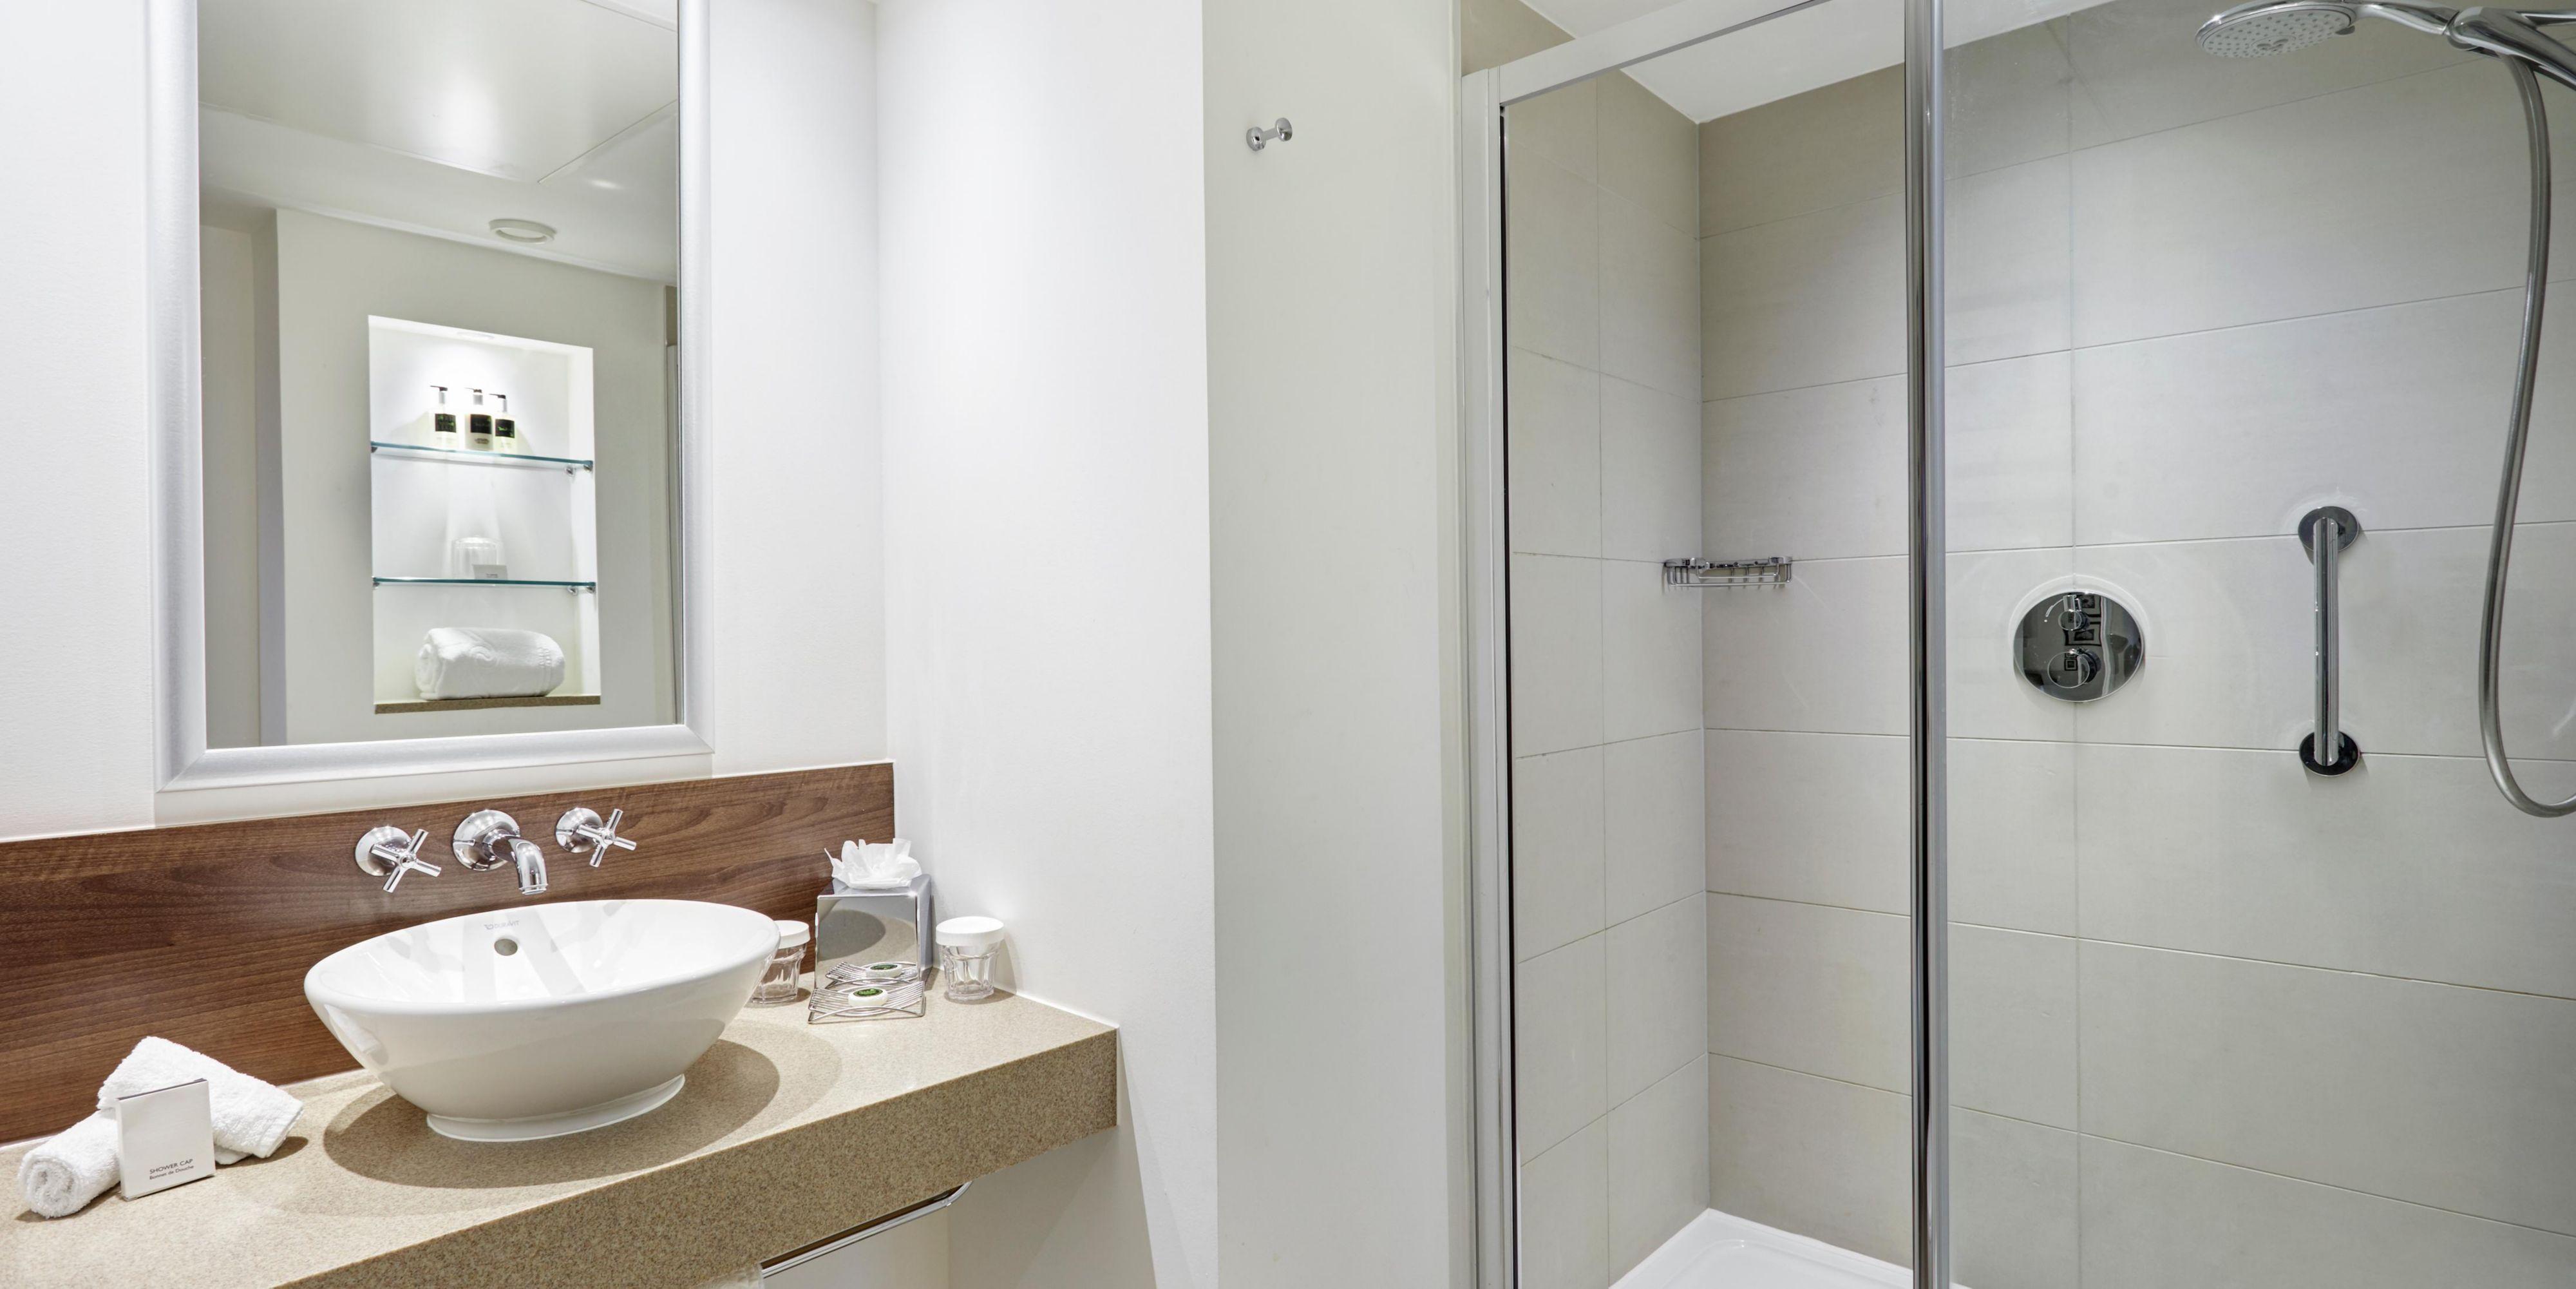 Extended Stay Hotel: Staybridge Suites Newcastle, UK